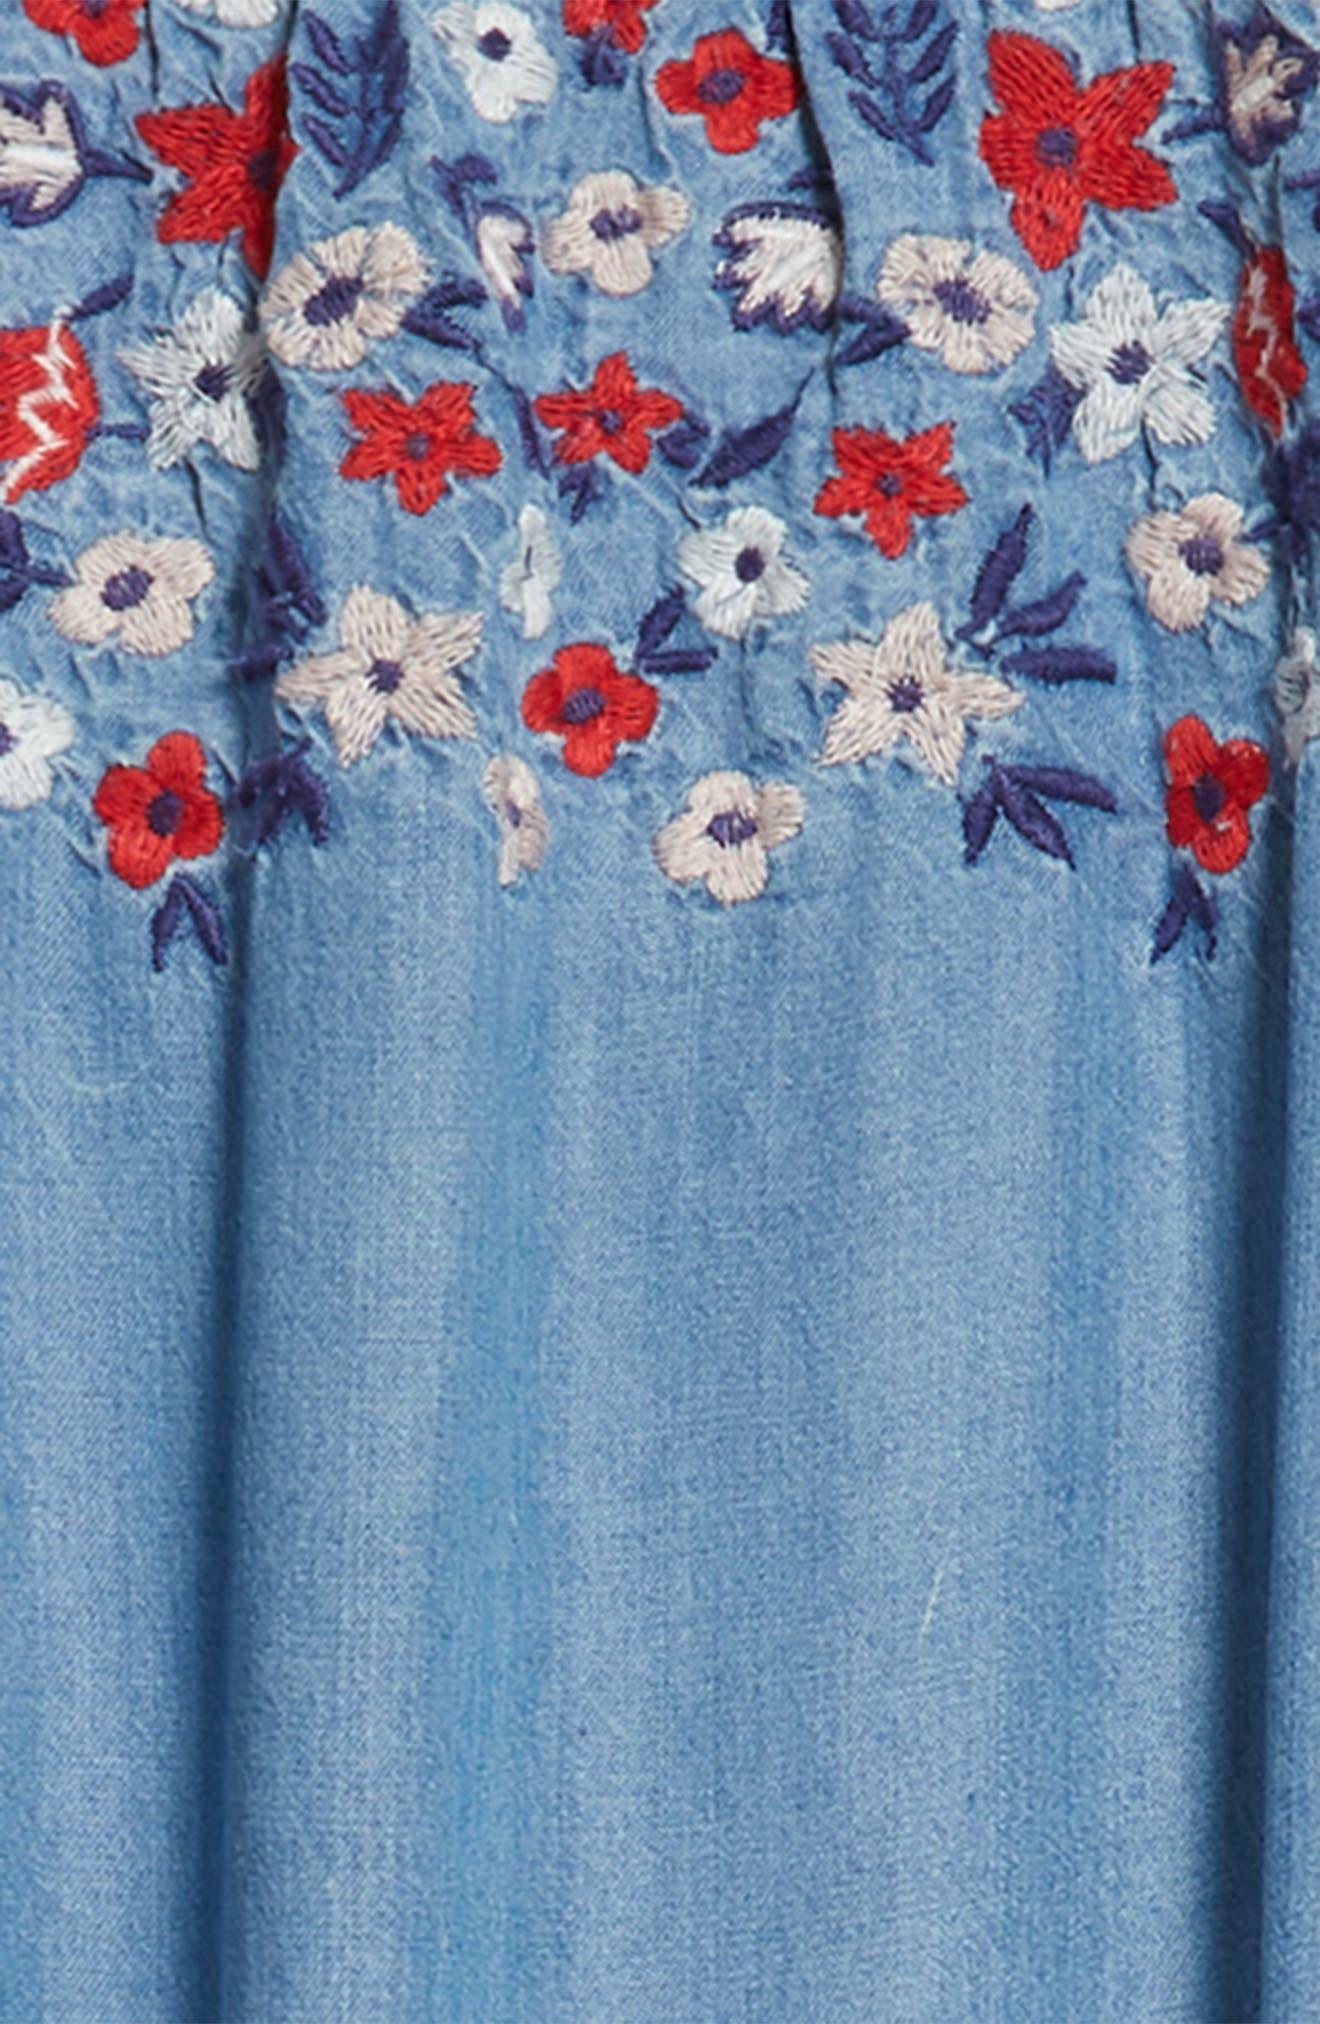 Flower Embroidered Off-the-Shoulder Dress,                             Alternate thumbnail 3, color,                             420